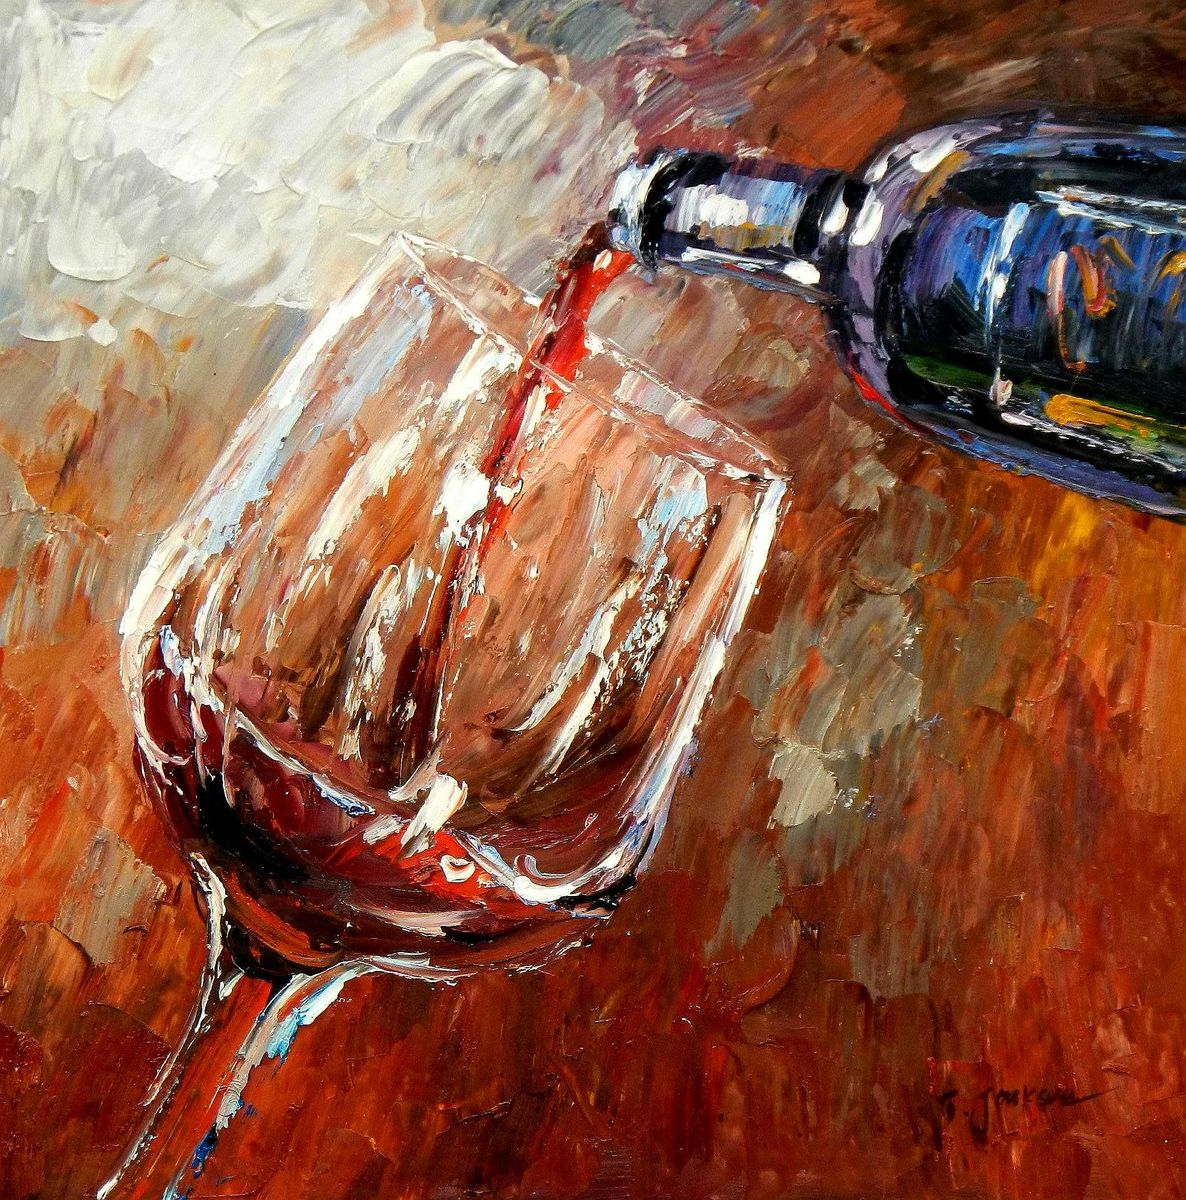 Modern Art - Winery Arts g95250 80x80cm Ölgemälde handgemalt